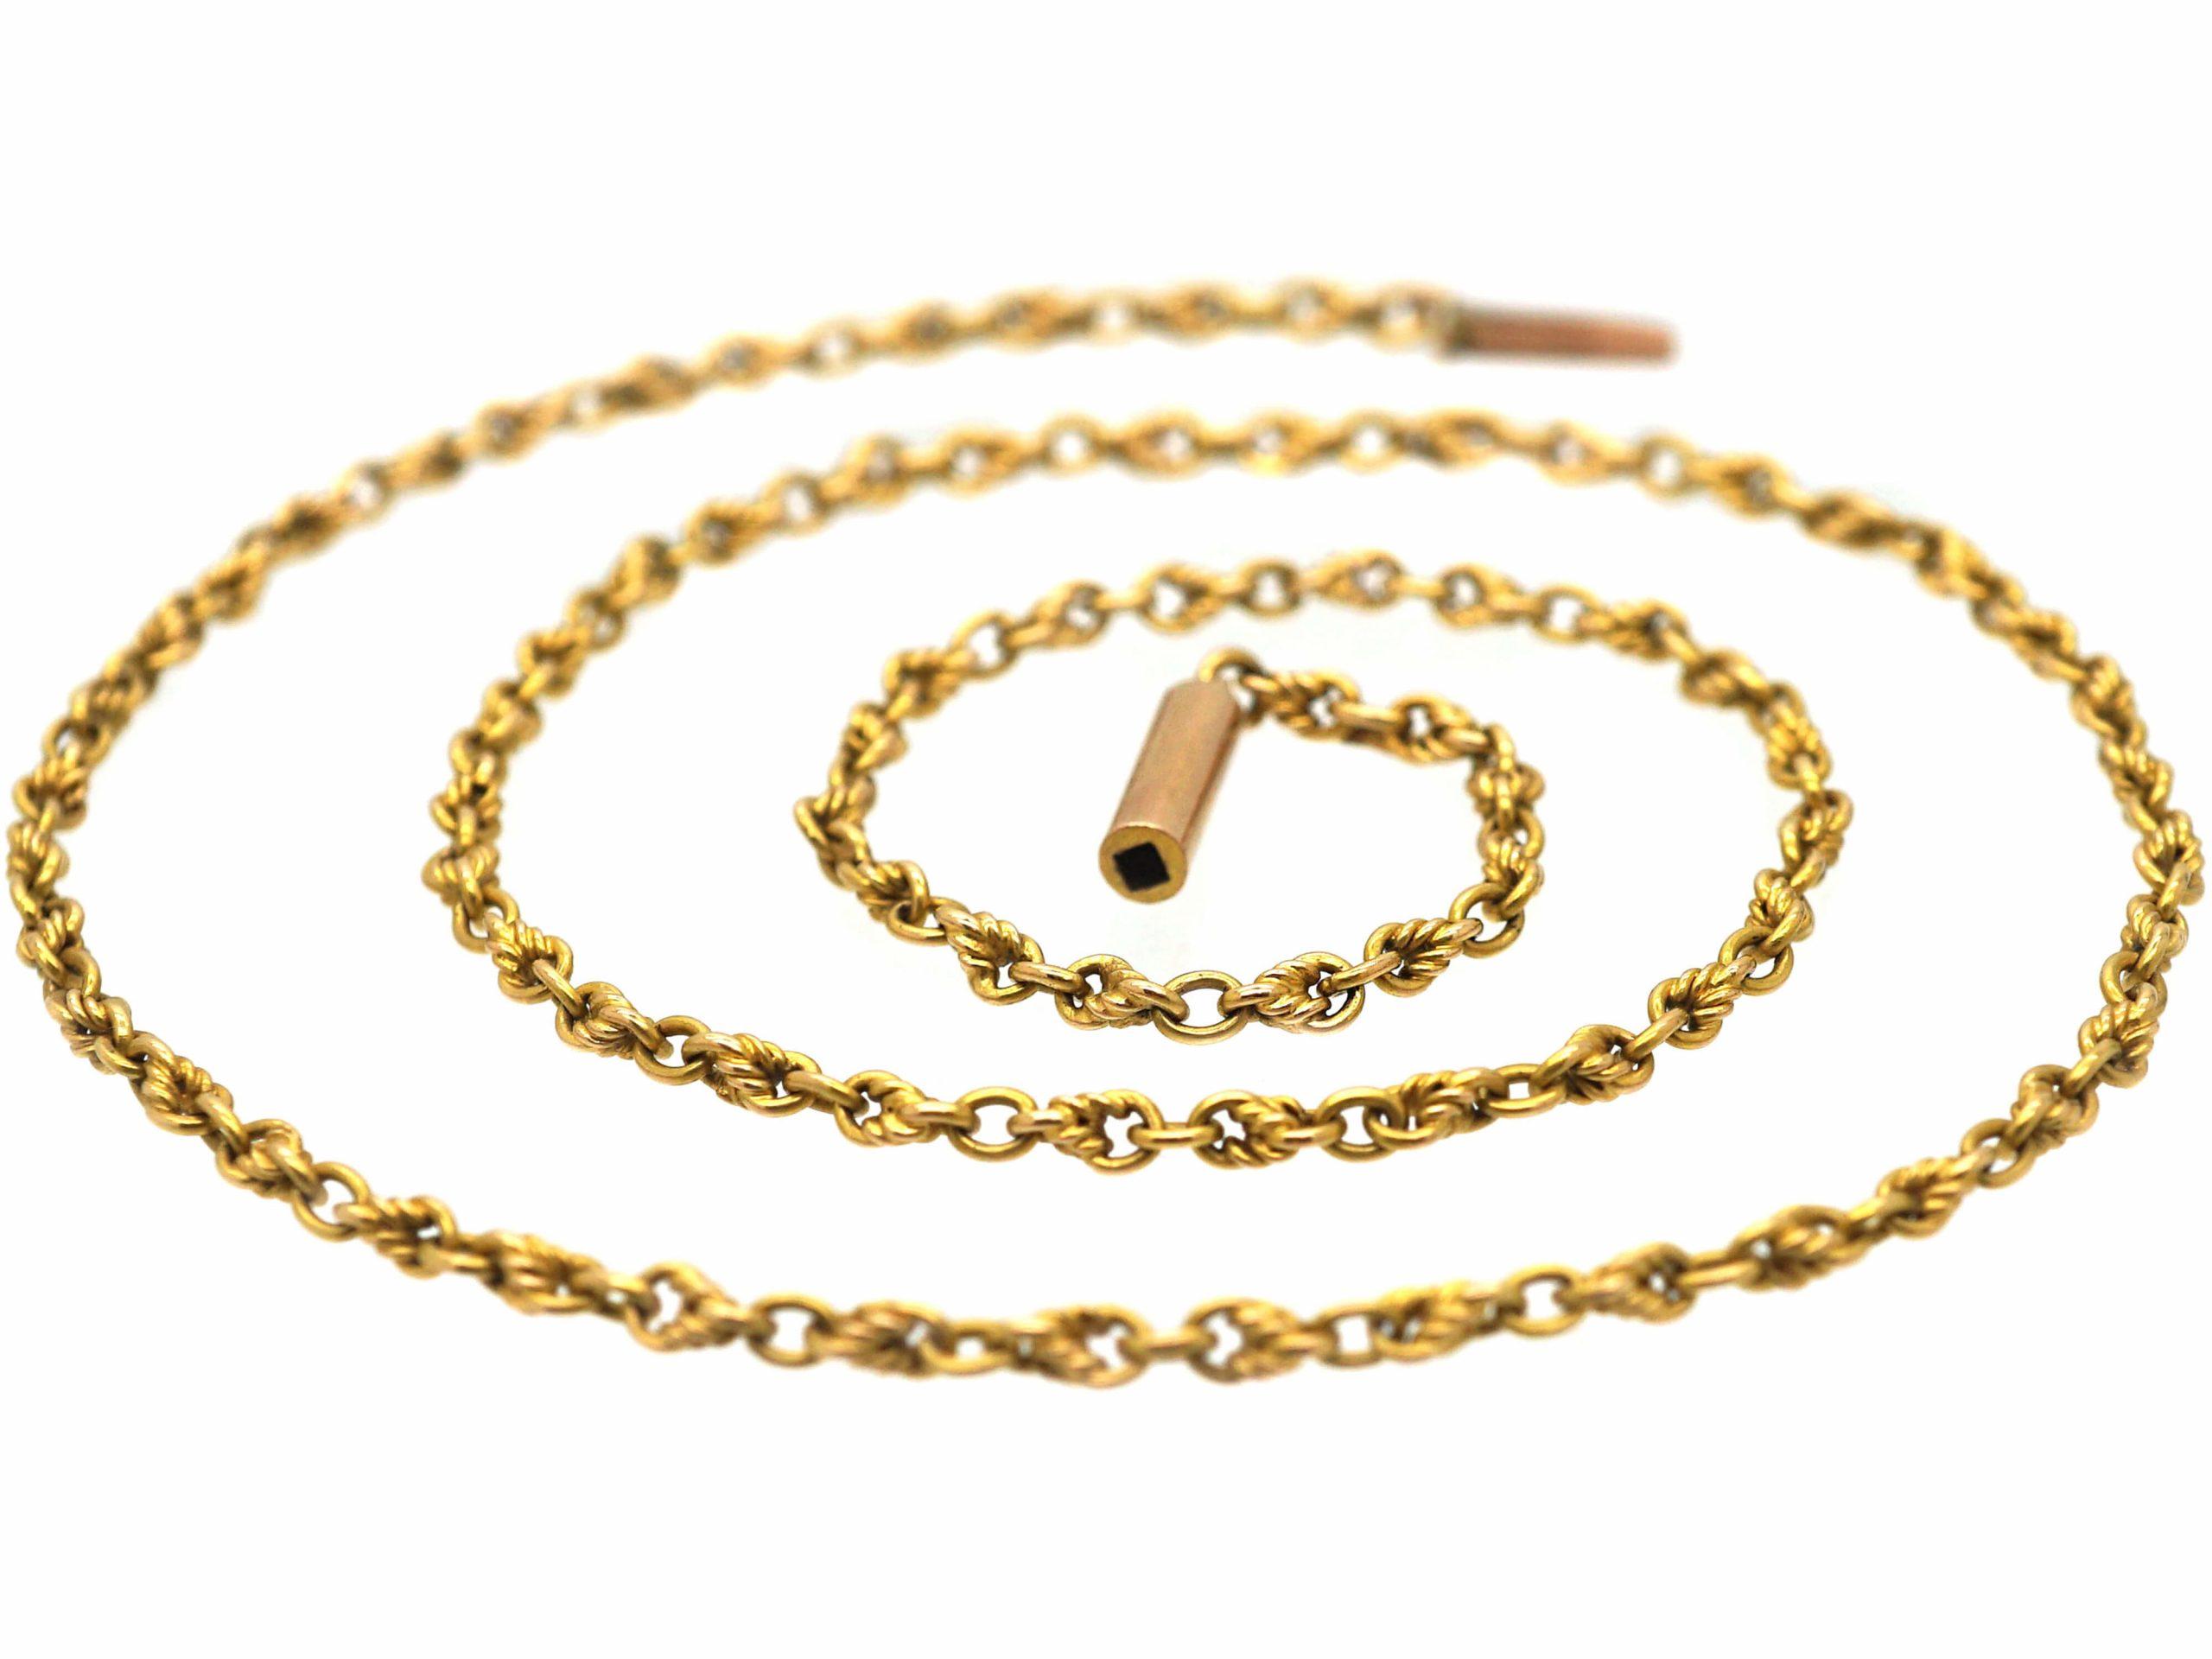 Edwardian 15ct Gold Ornate Chain